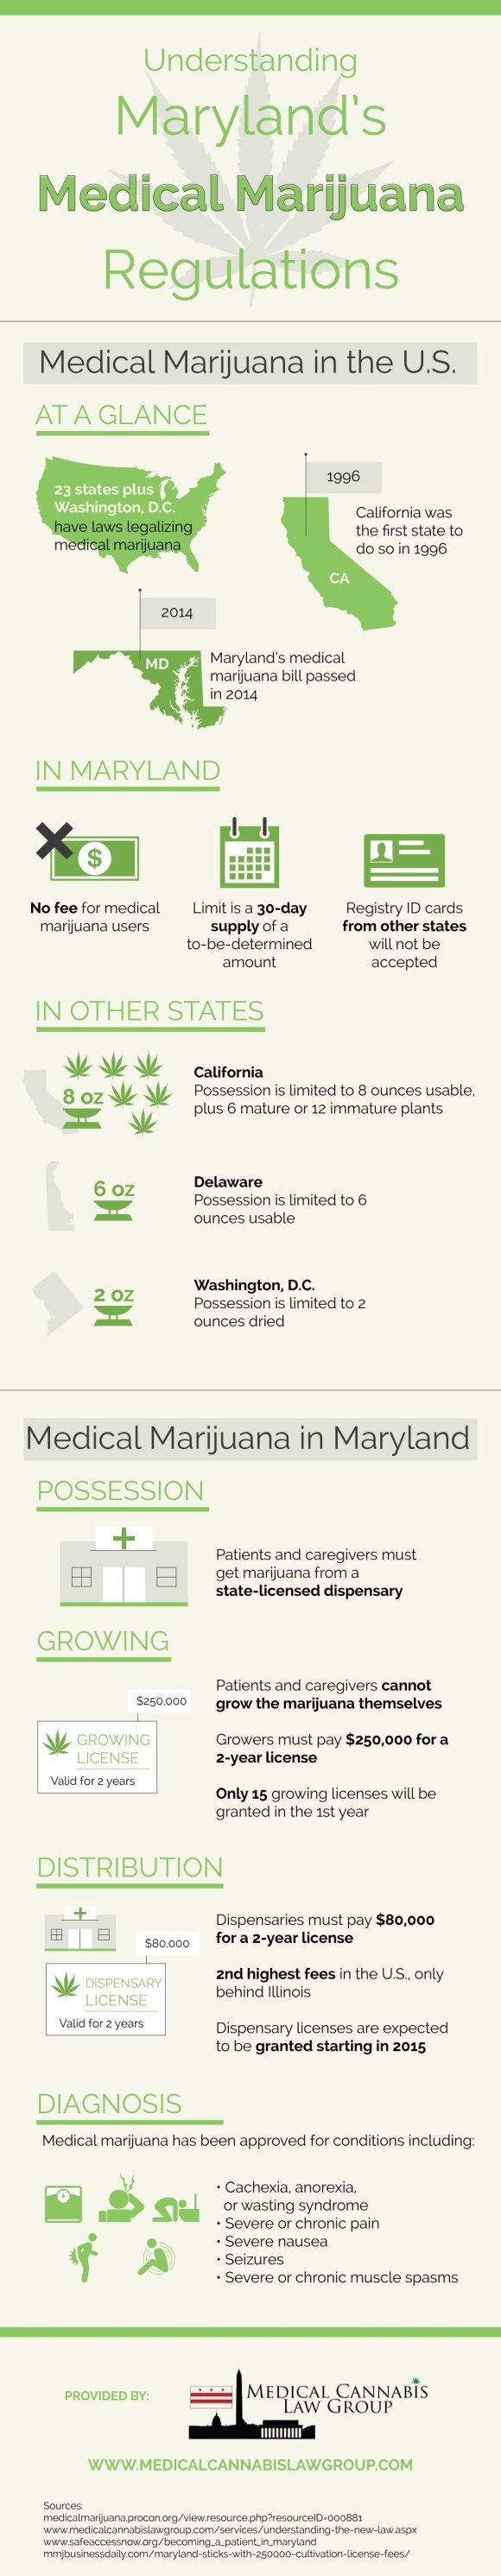 Maryland Medical Marijuana Regulations Infographic